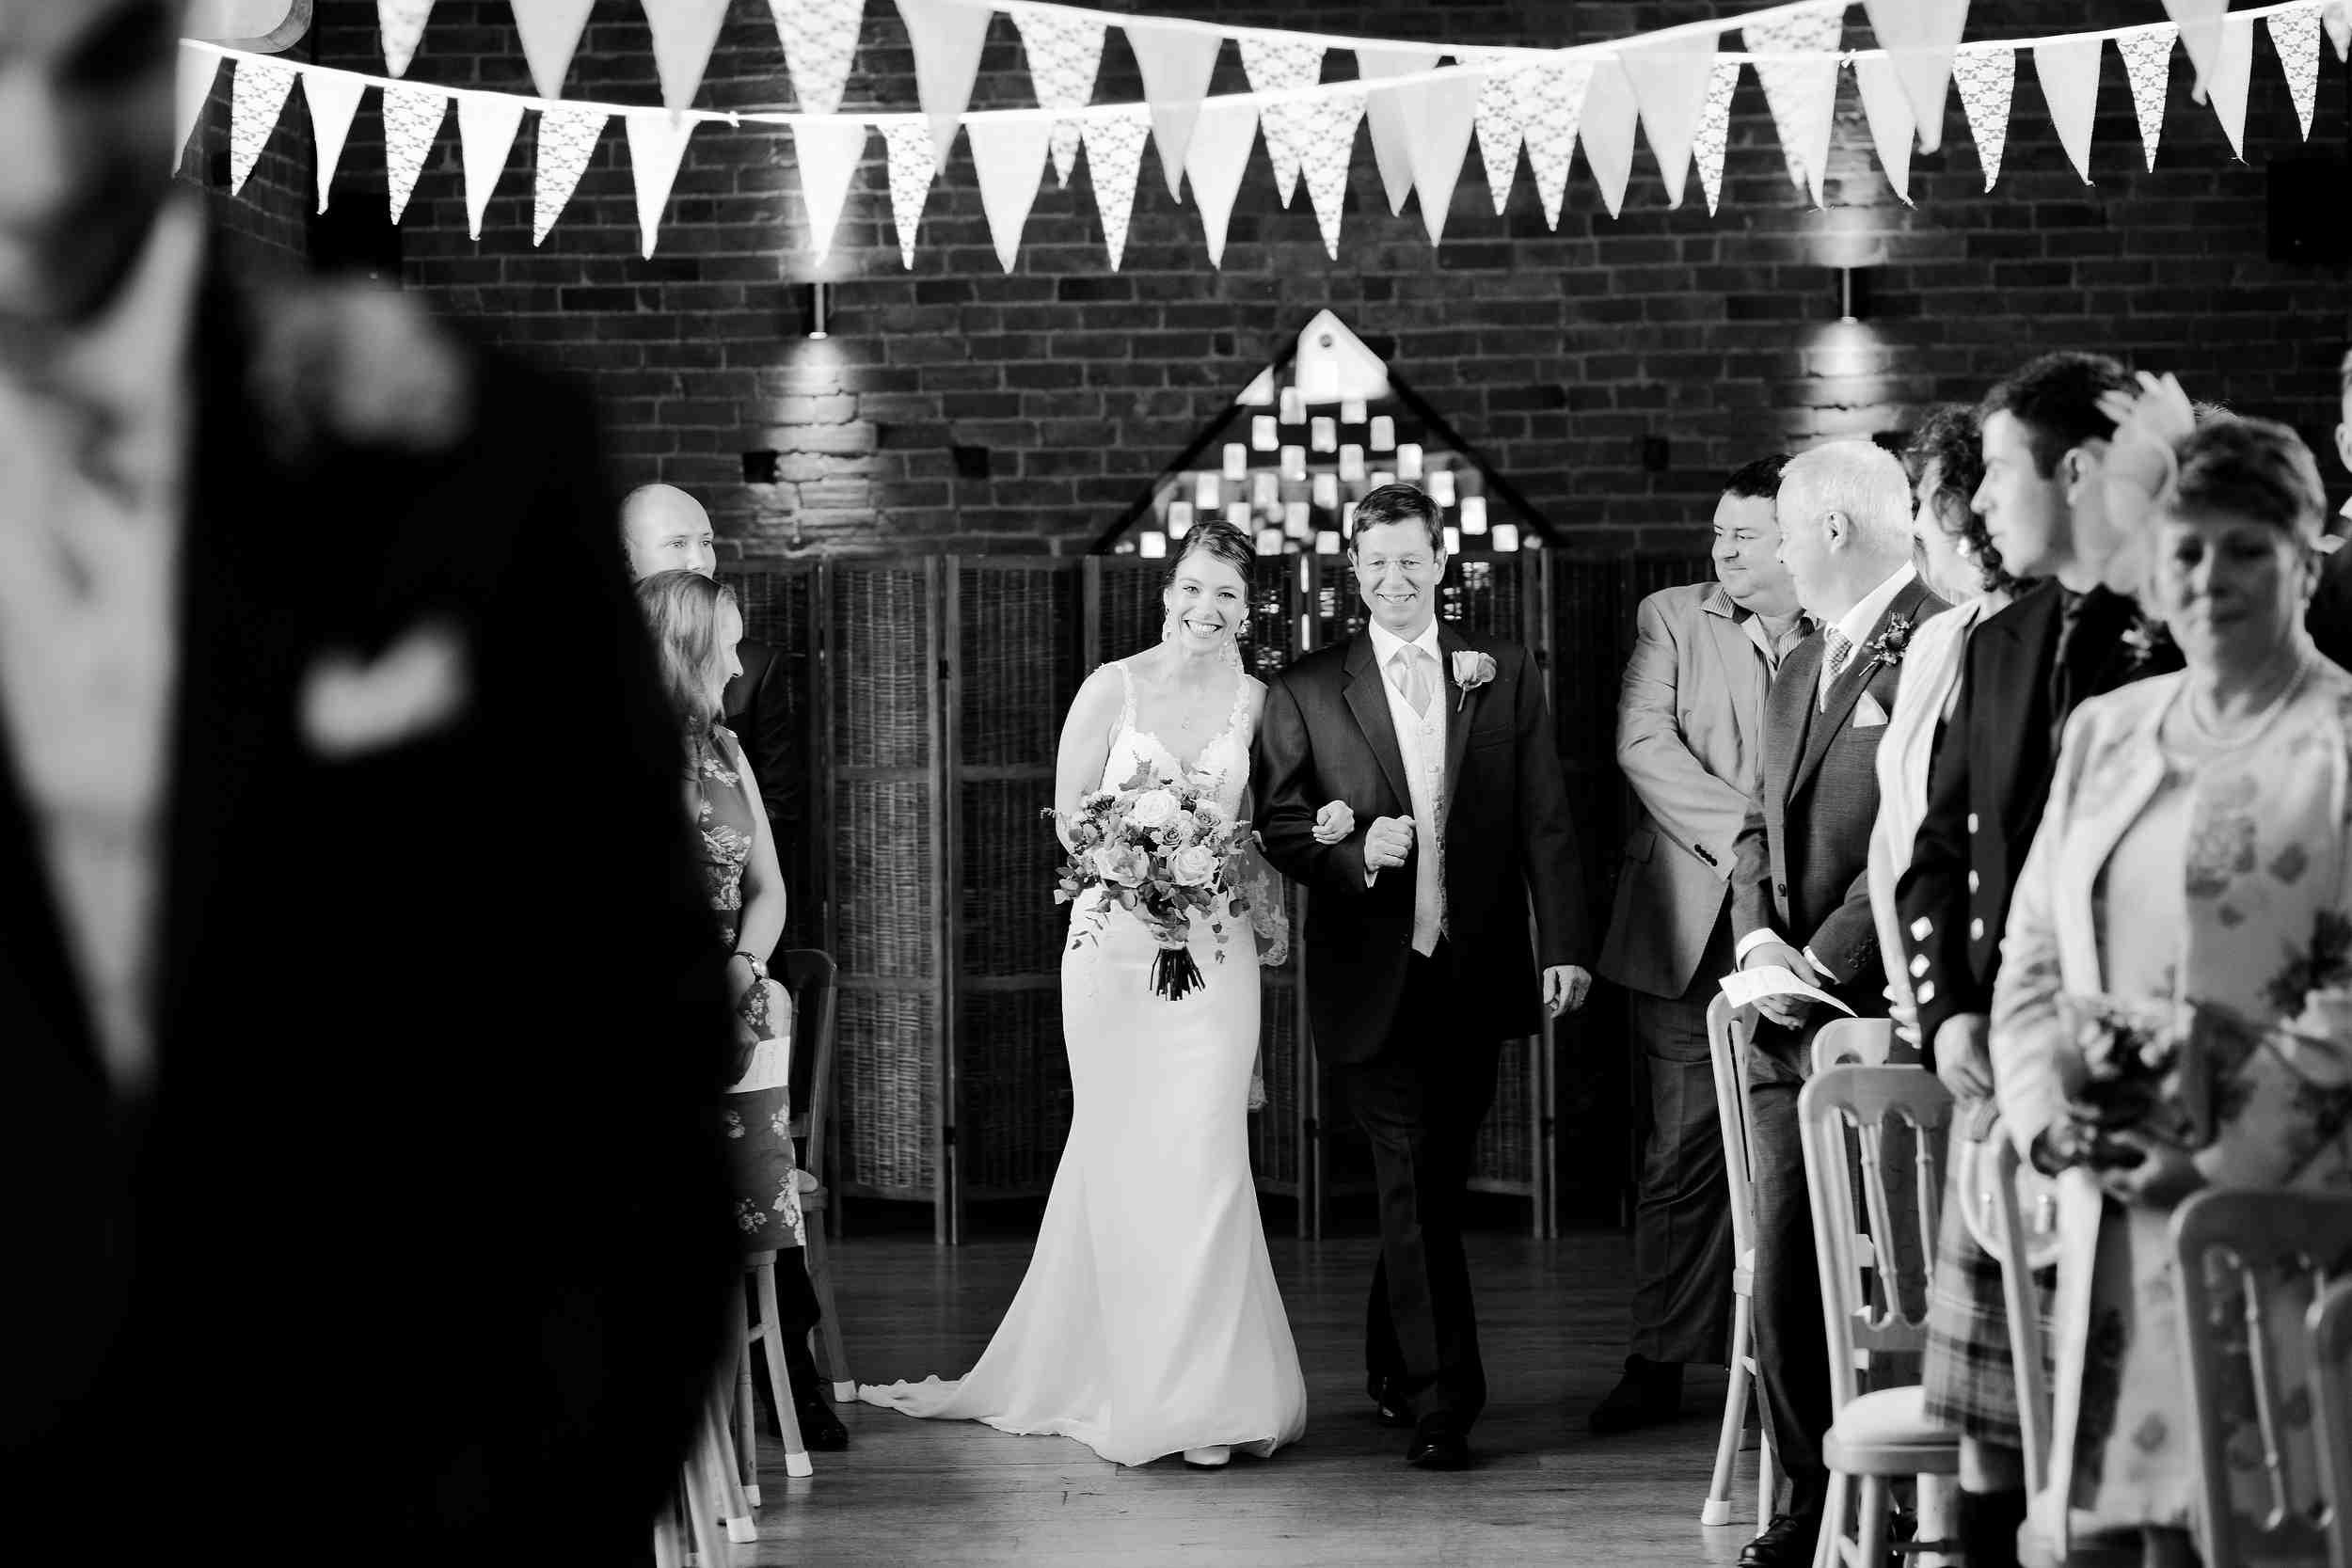 Modern_Stylish_Wedding_at_Swallows_Nest_Barn1174